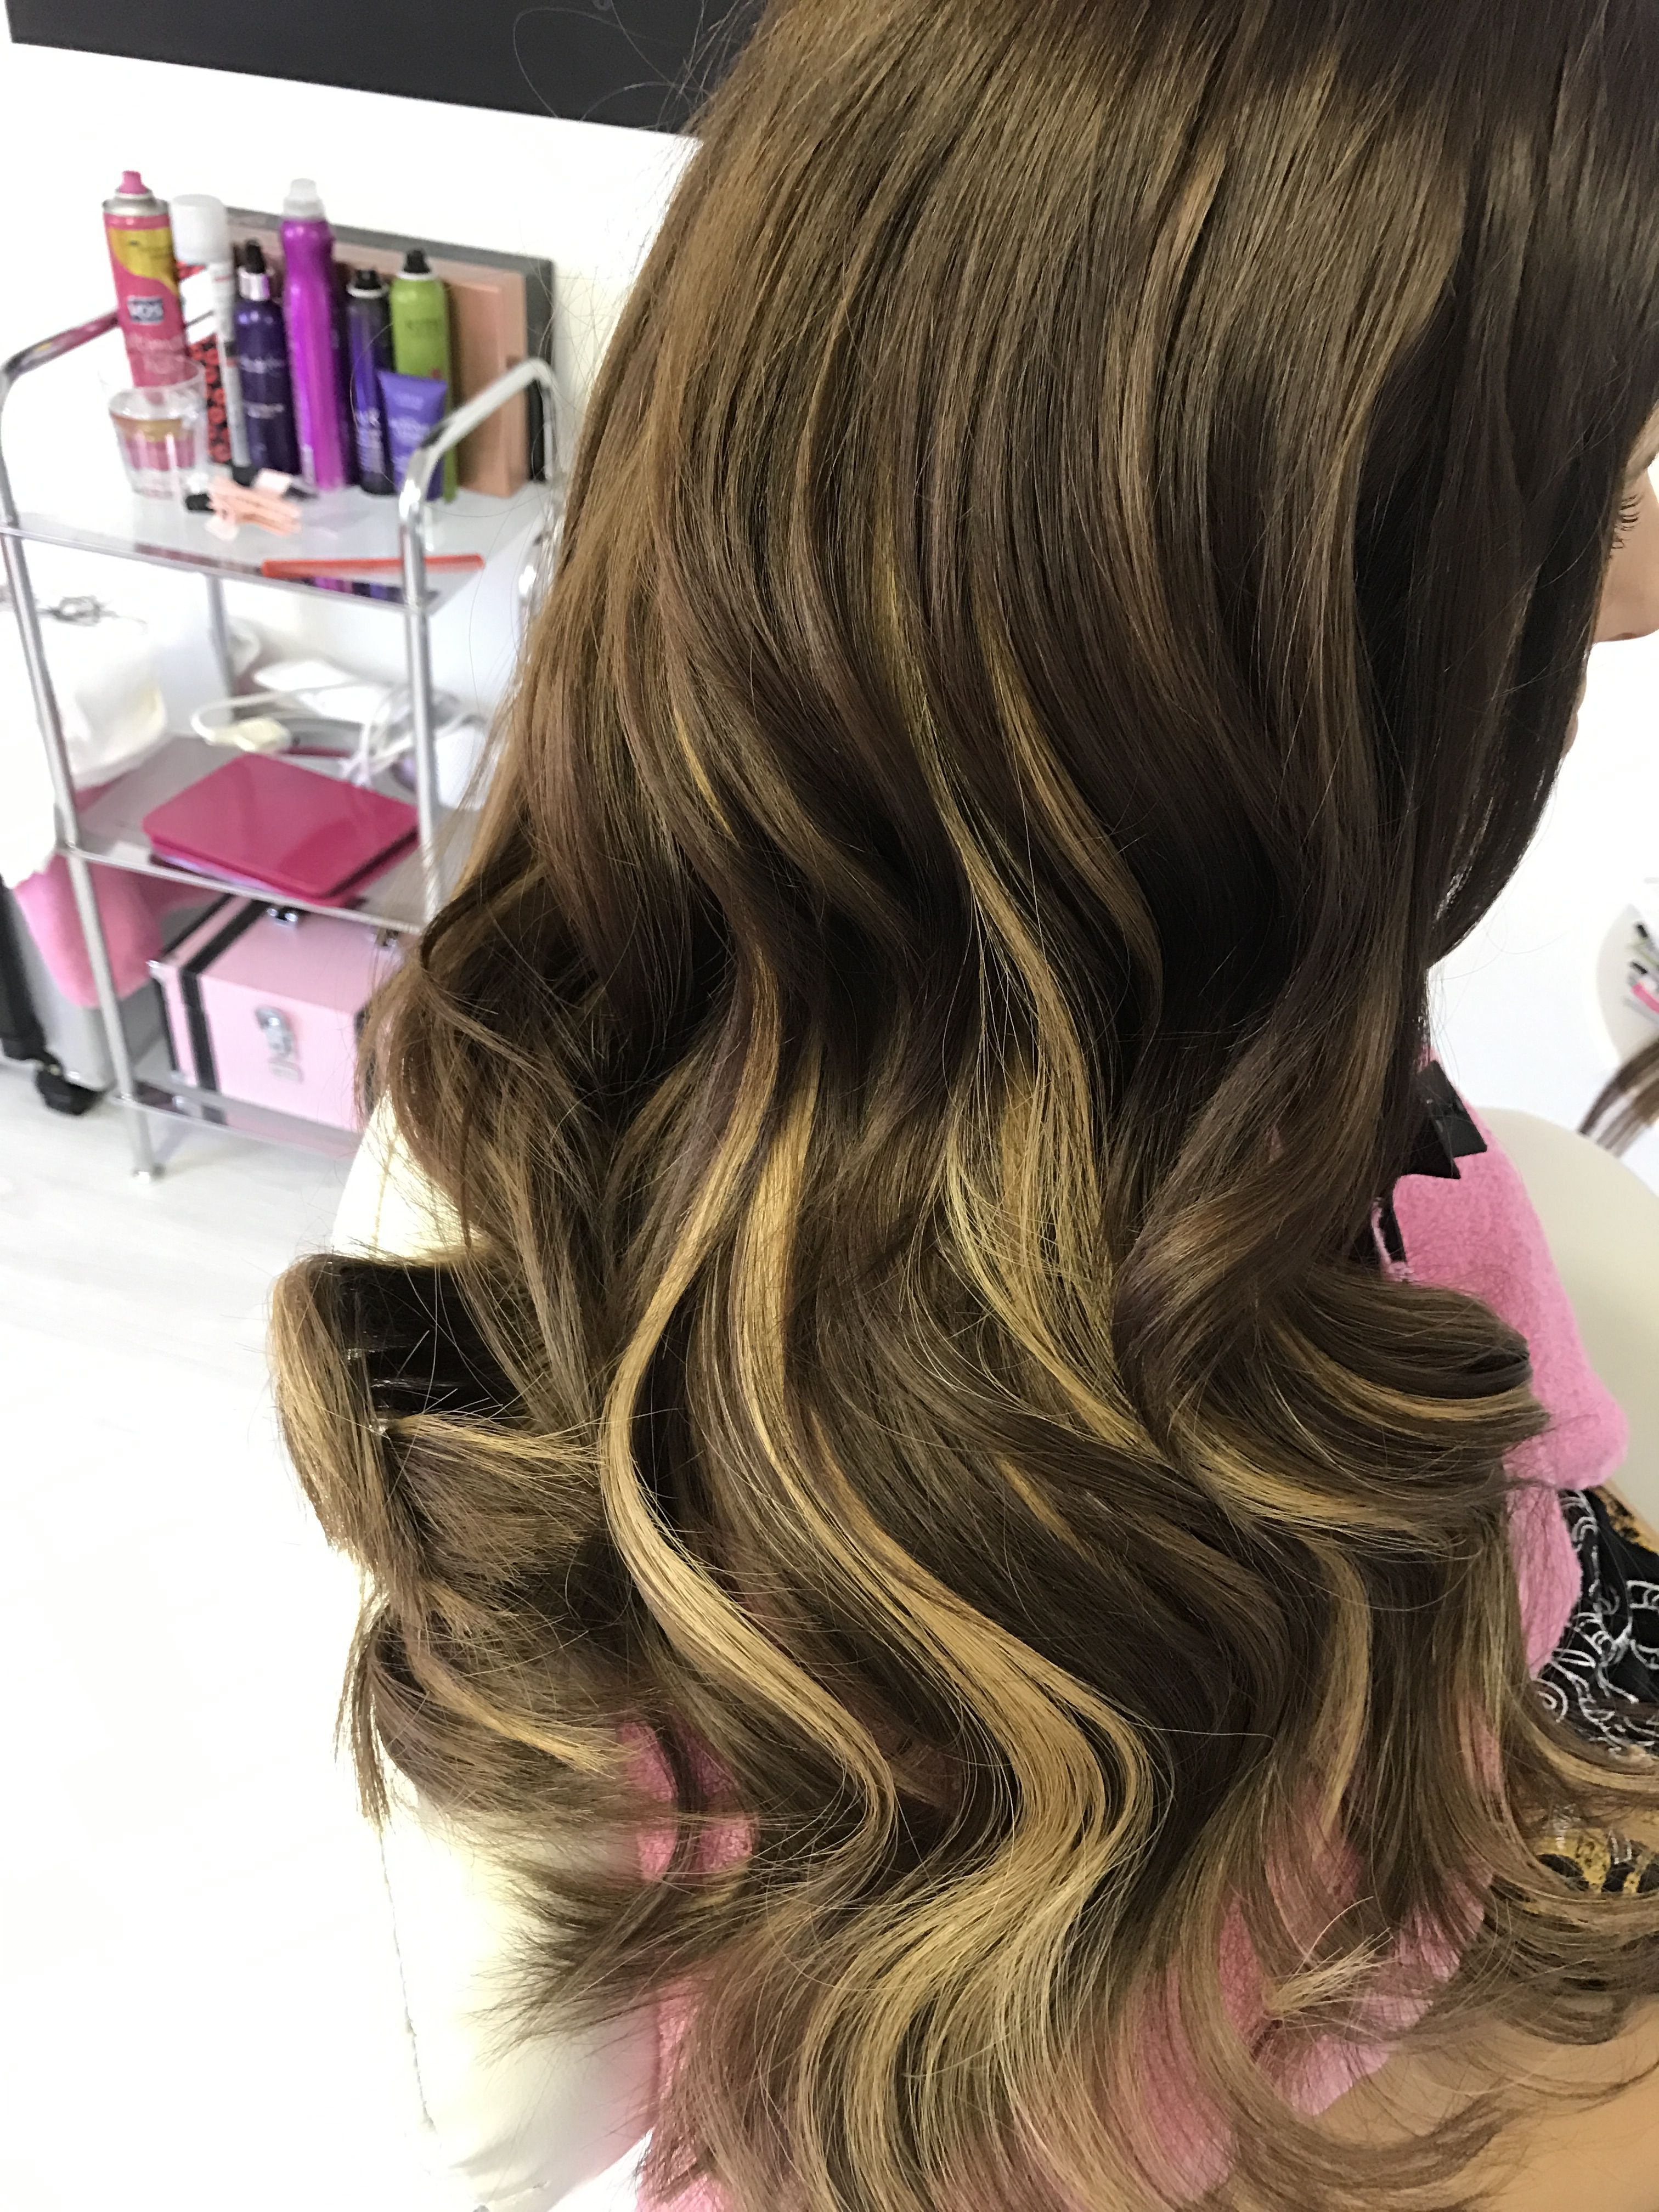 Adding Colour Using Hair Extensions By Mychellecaroline Hair